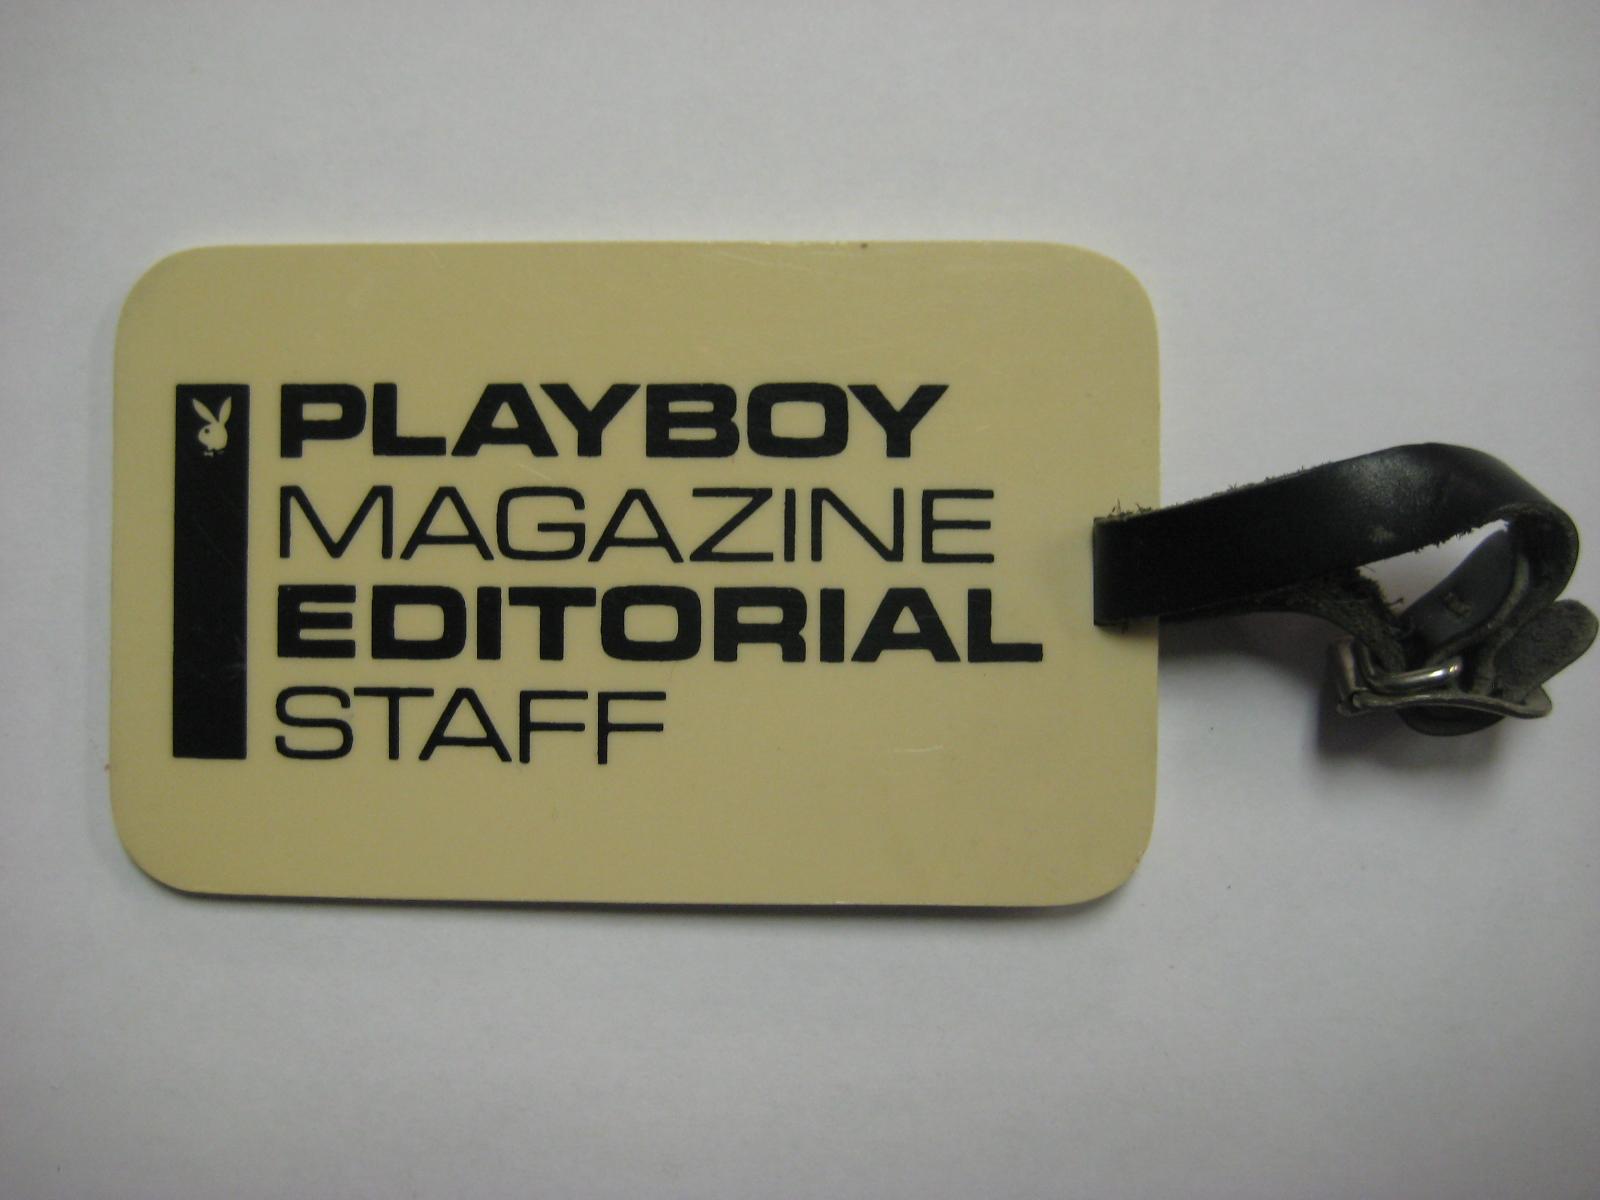 Playboy Magazine Editorial Staff Badge